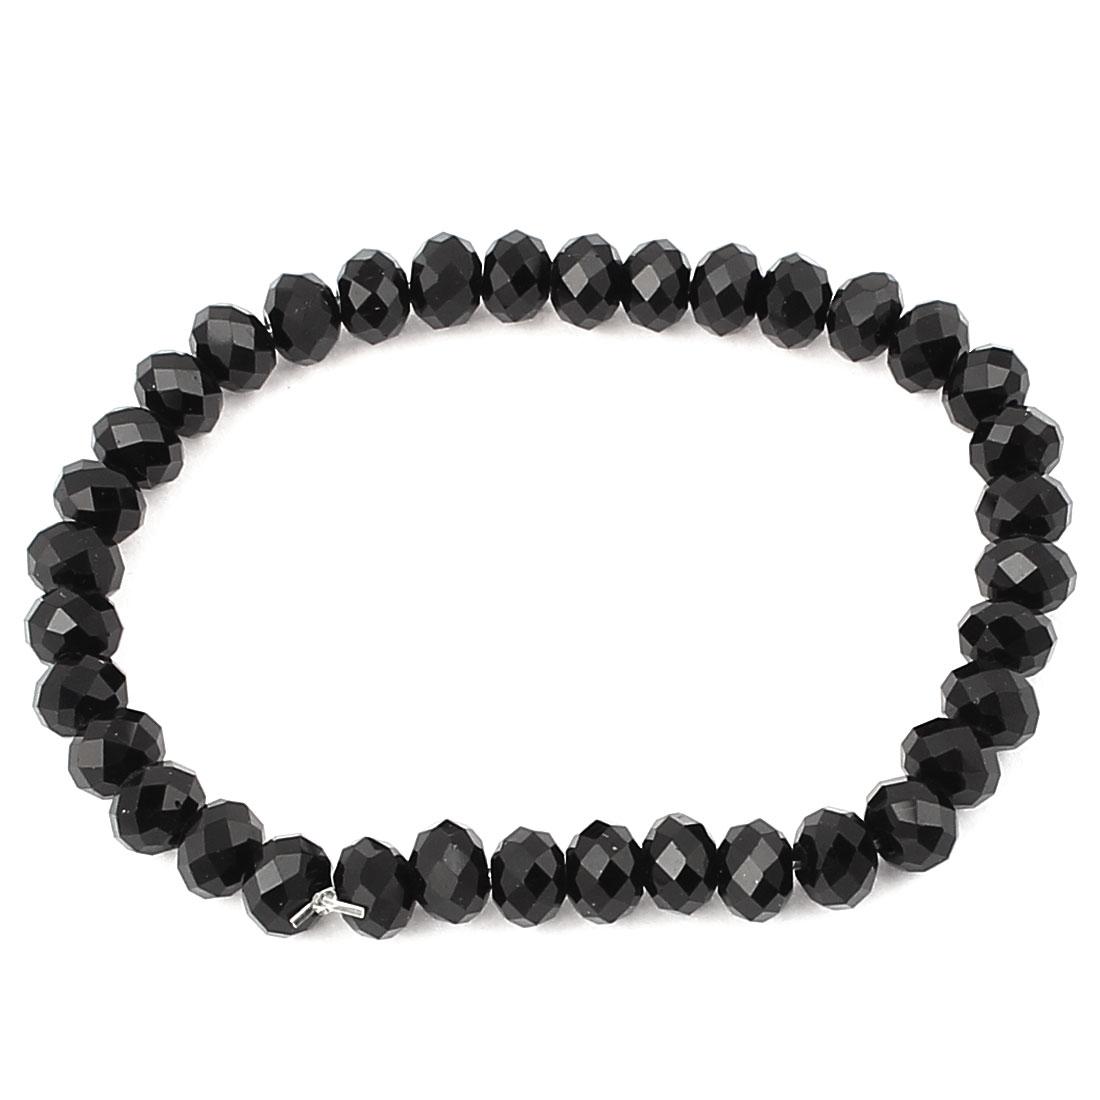 Lady Women Black 6mm Beads Adjustable Bracelet Wristband